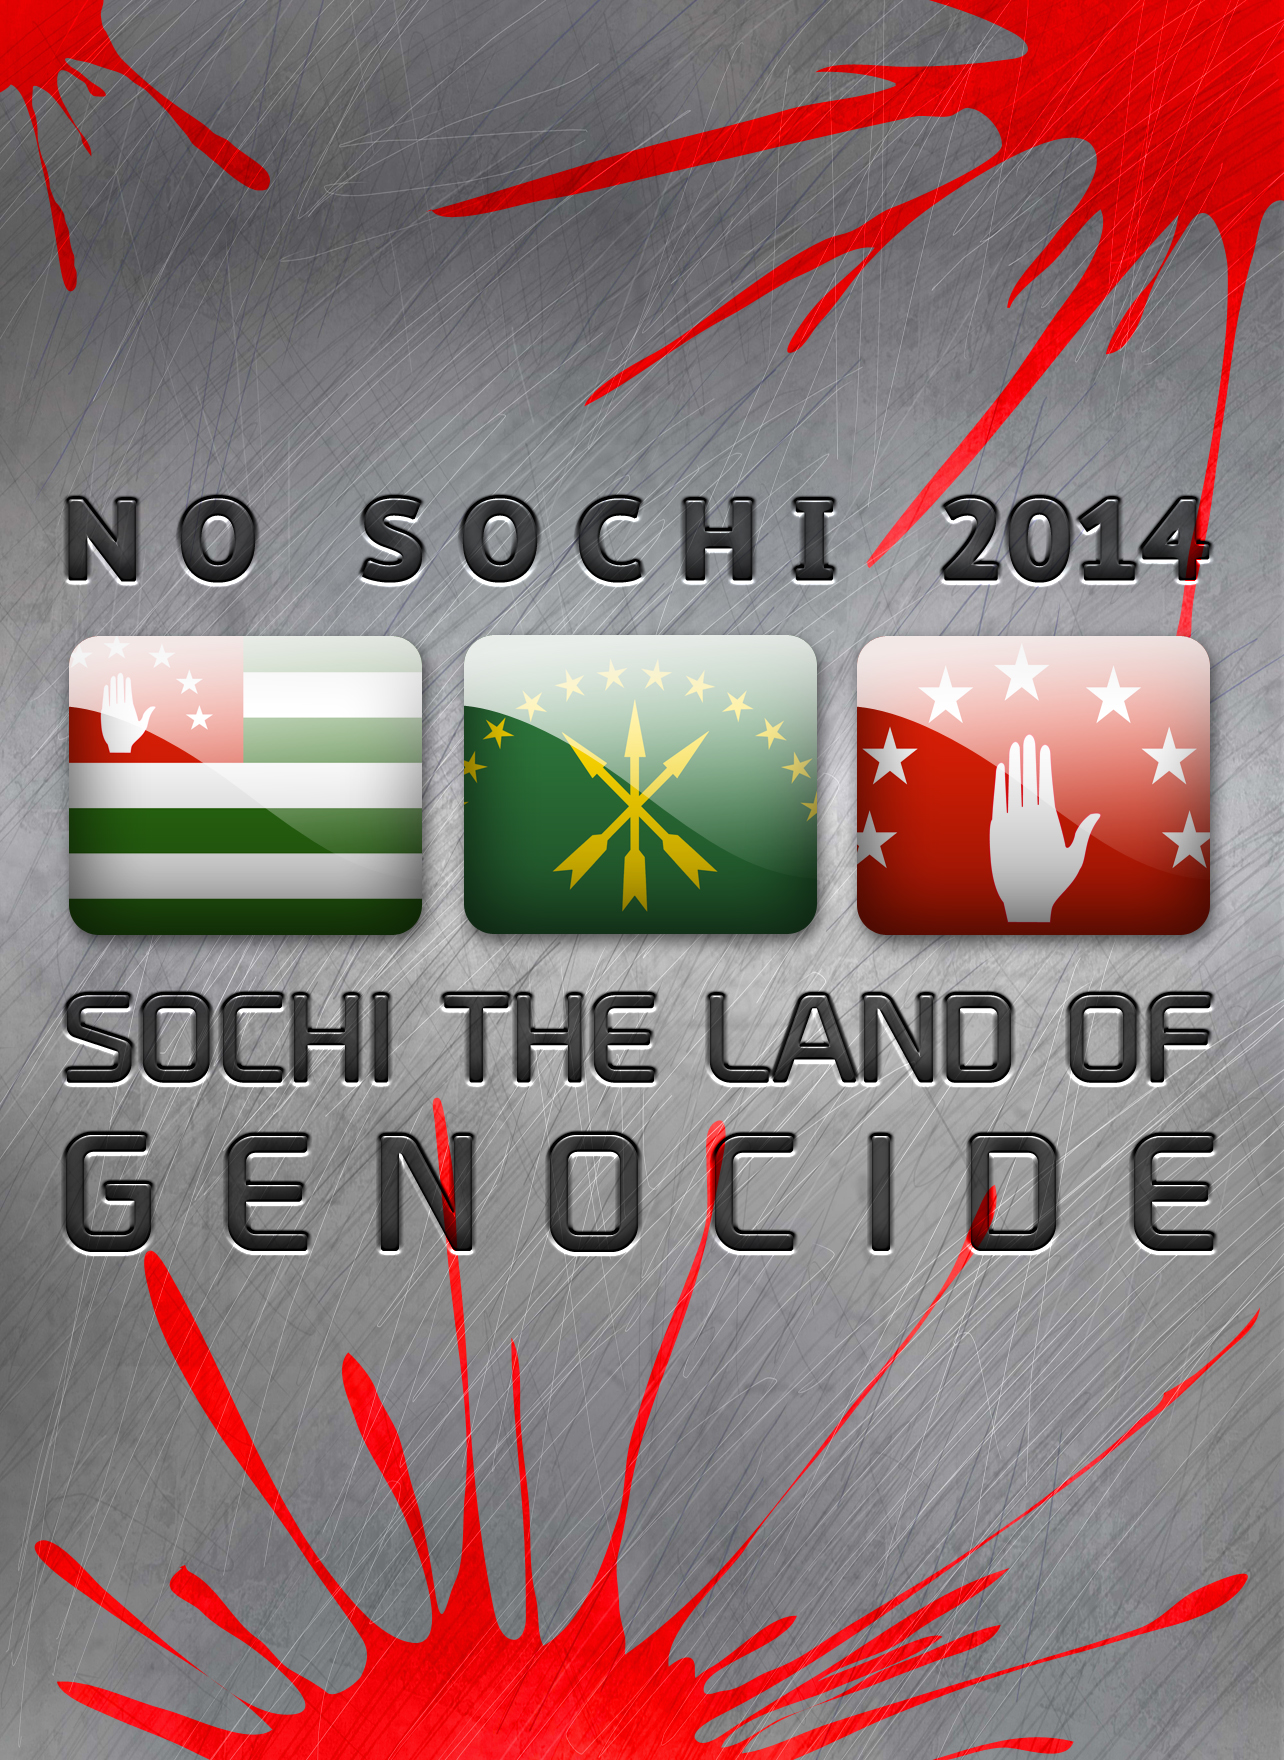 NO SOCHI 2014 - SOCHI THE LAND OF GENOCIDE by amirdjigit